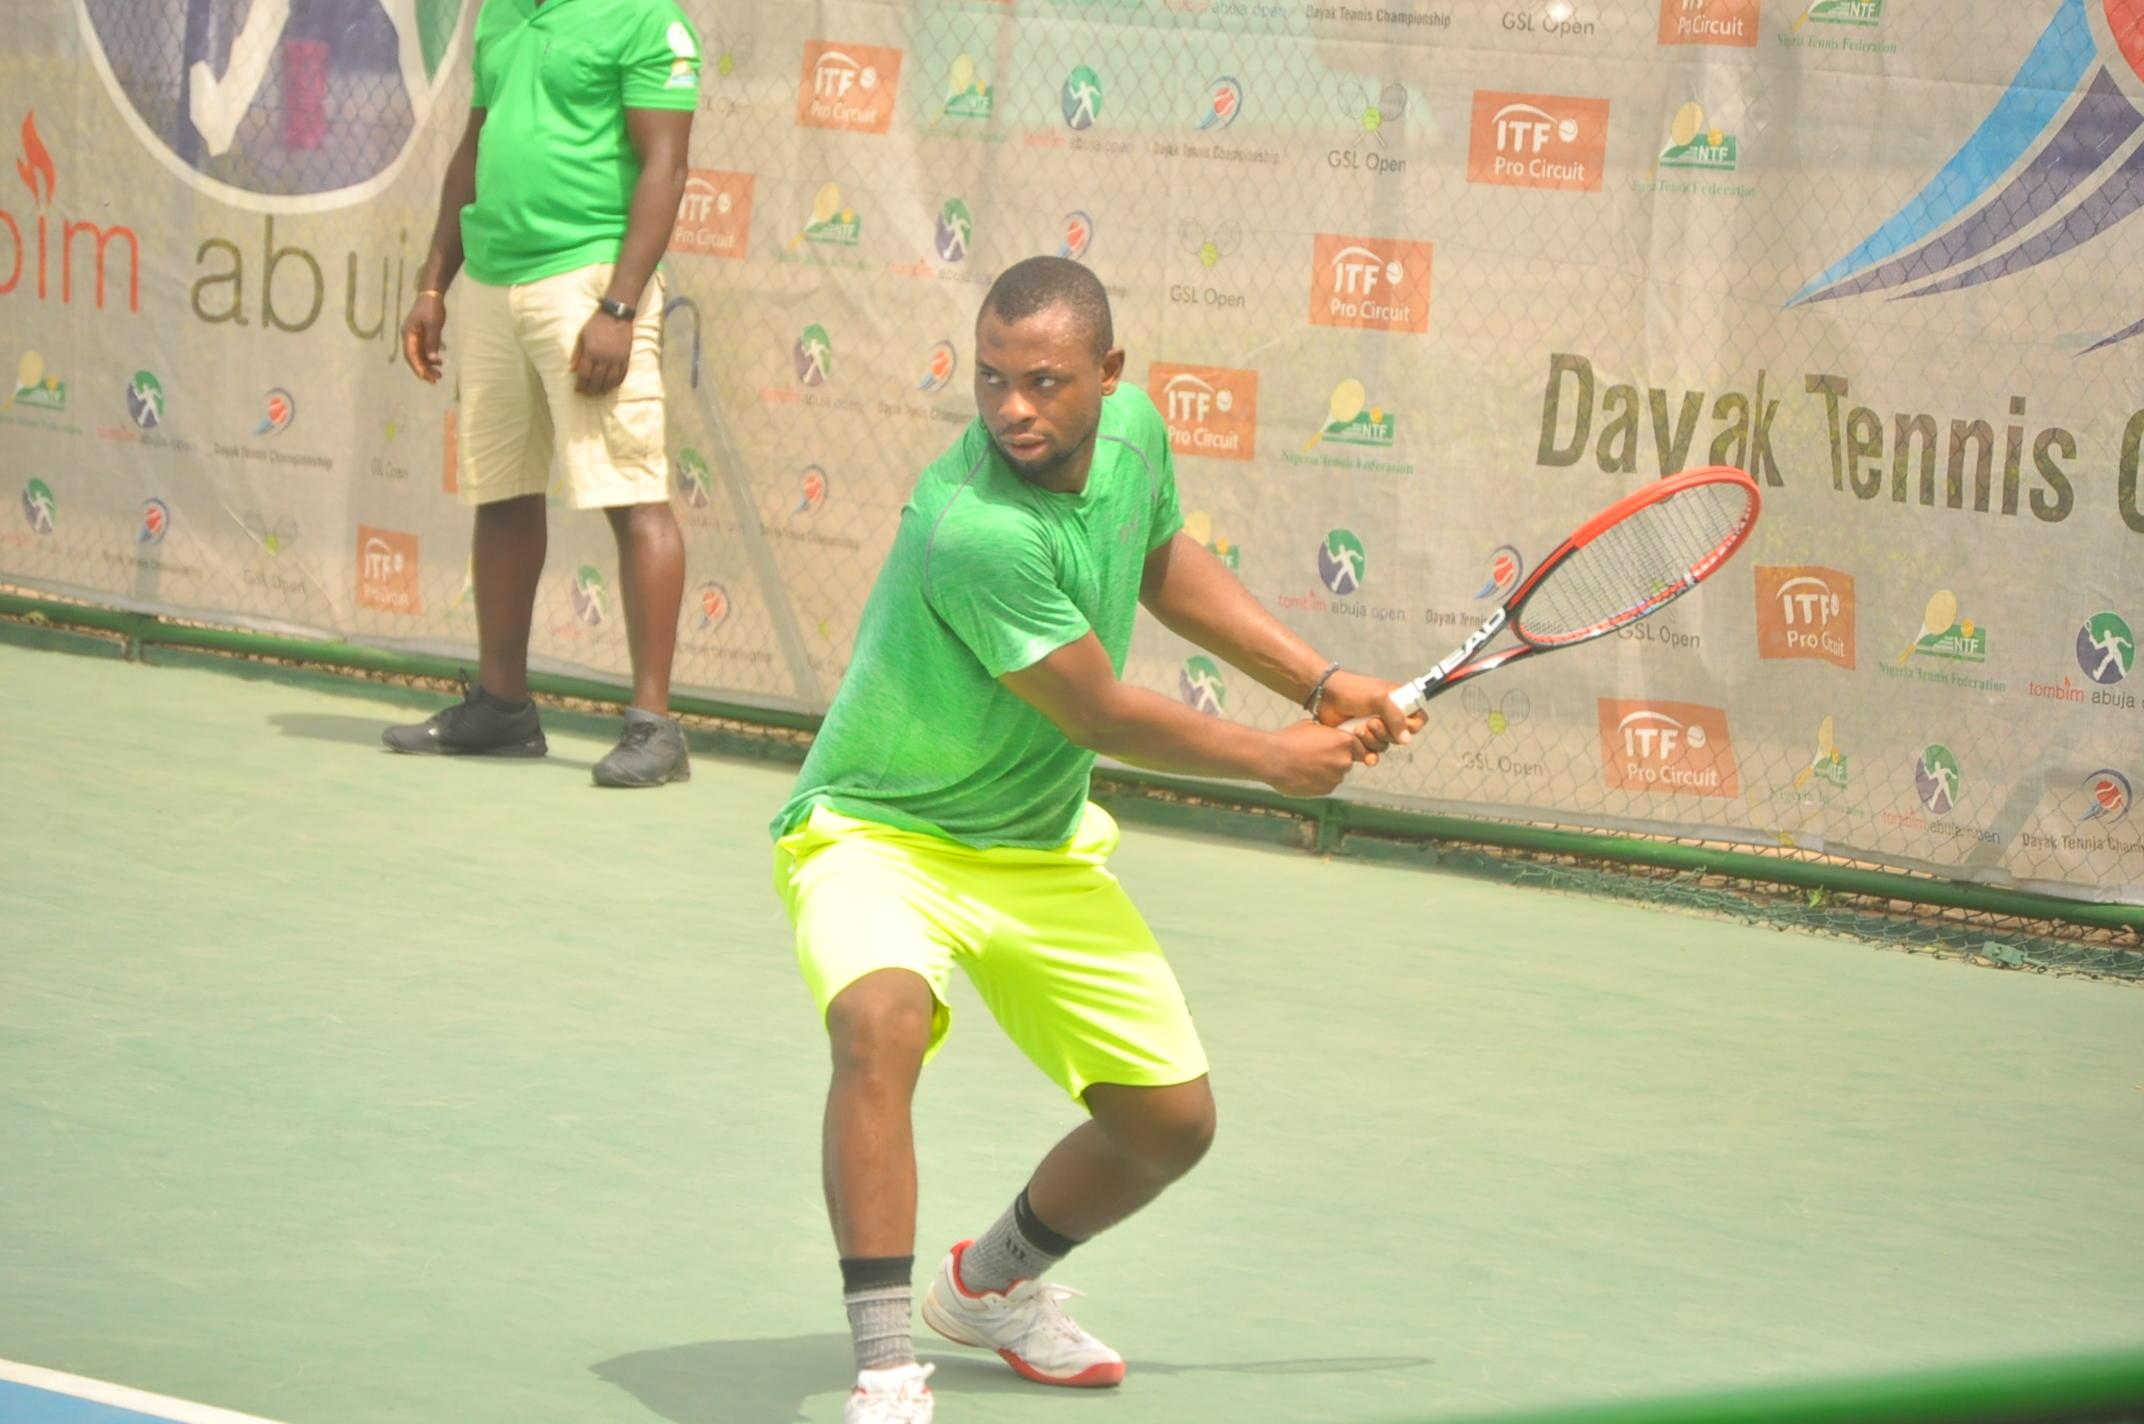 NTF Tennis